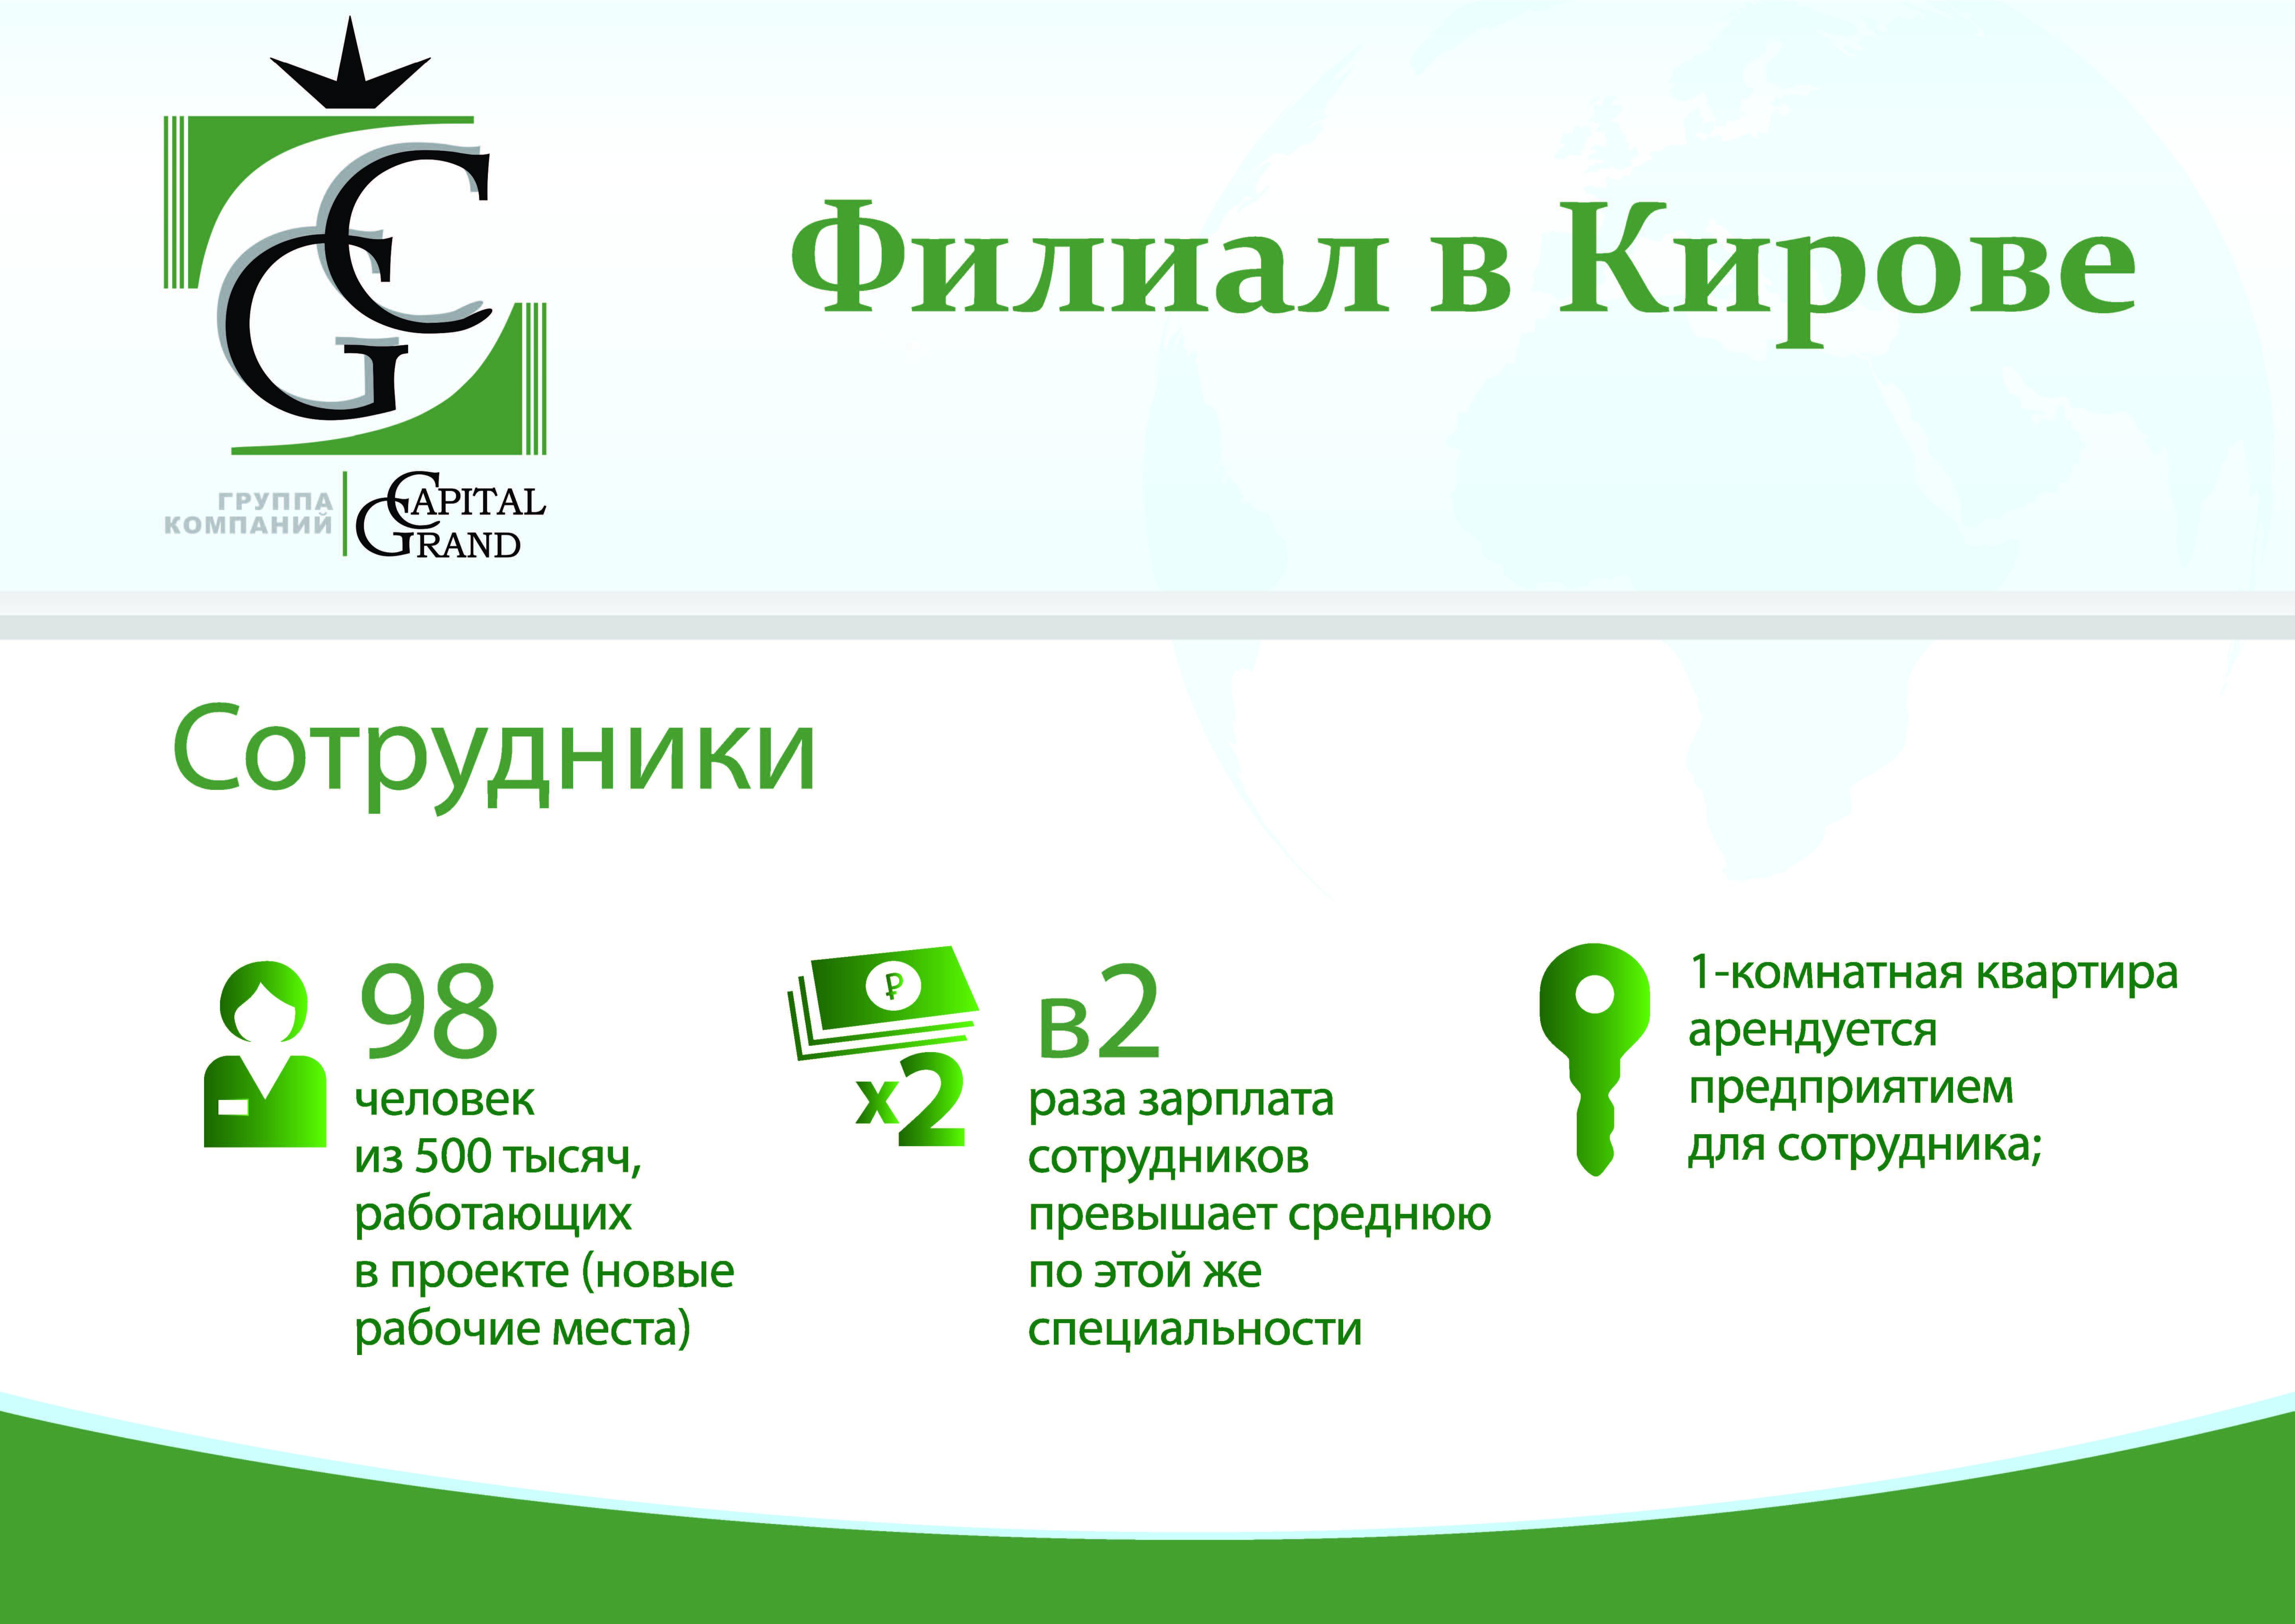 презентация гранд капитал_Page_06